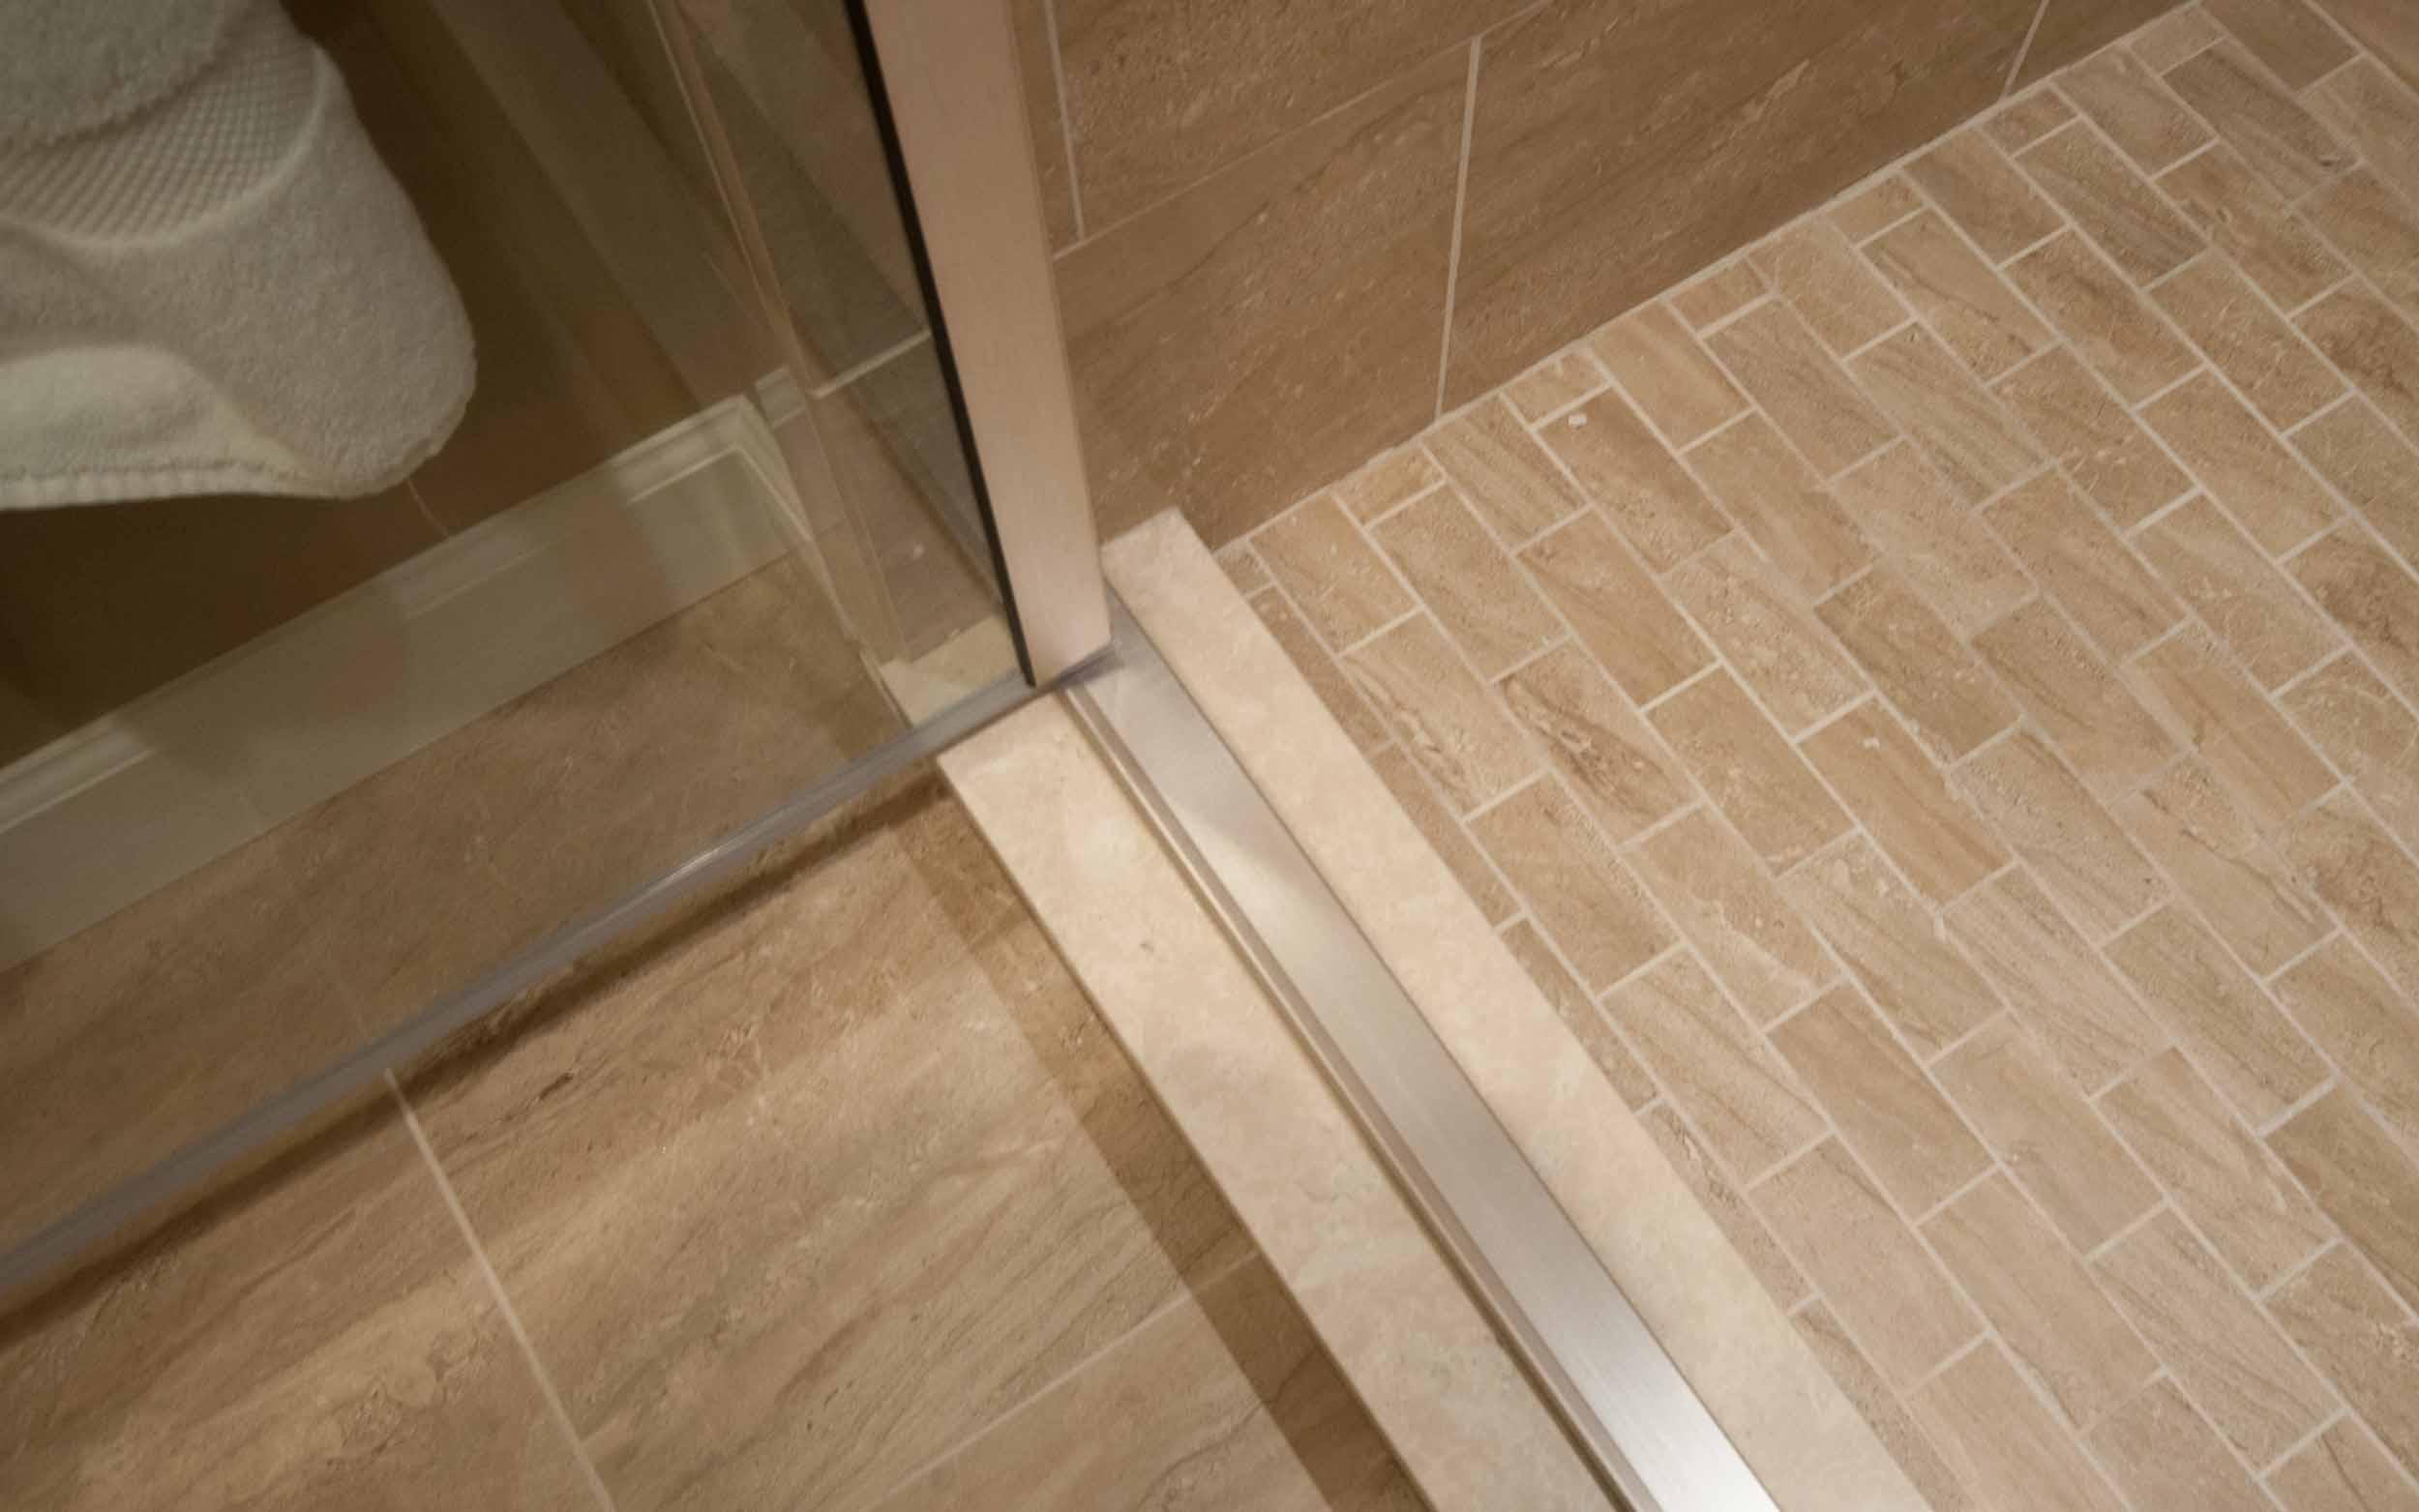 S bath floor.jpg